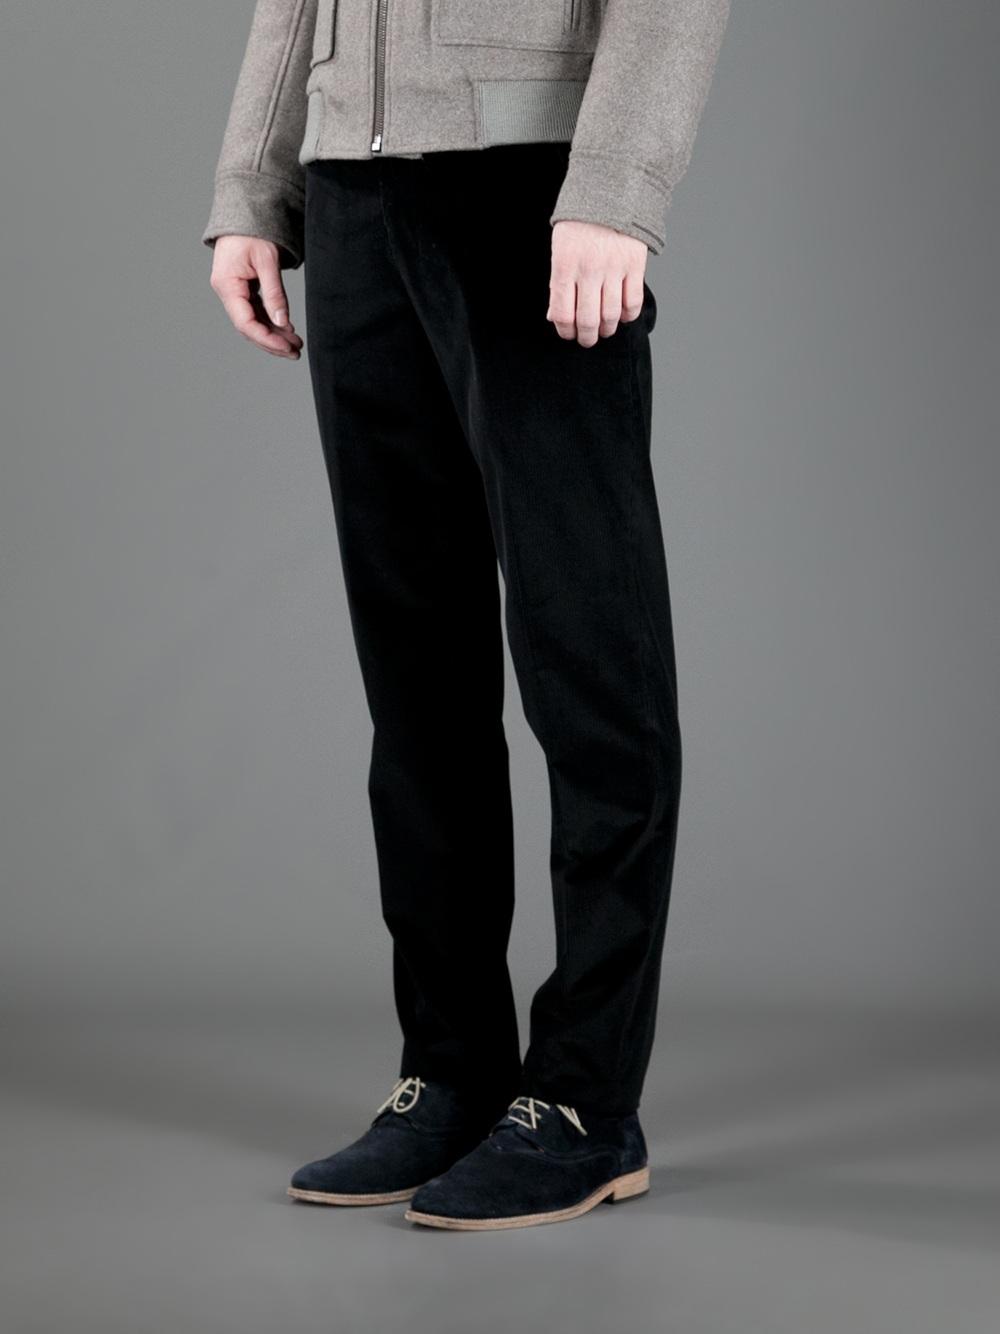 Lyst Saint Laurent Corduroy Trouser In Black For Men